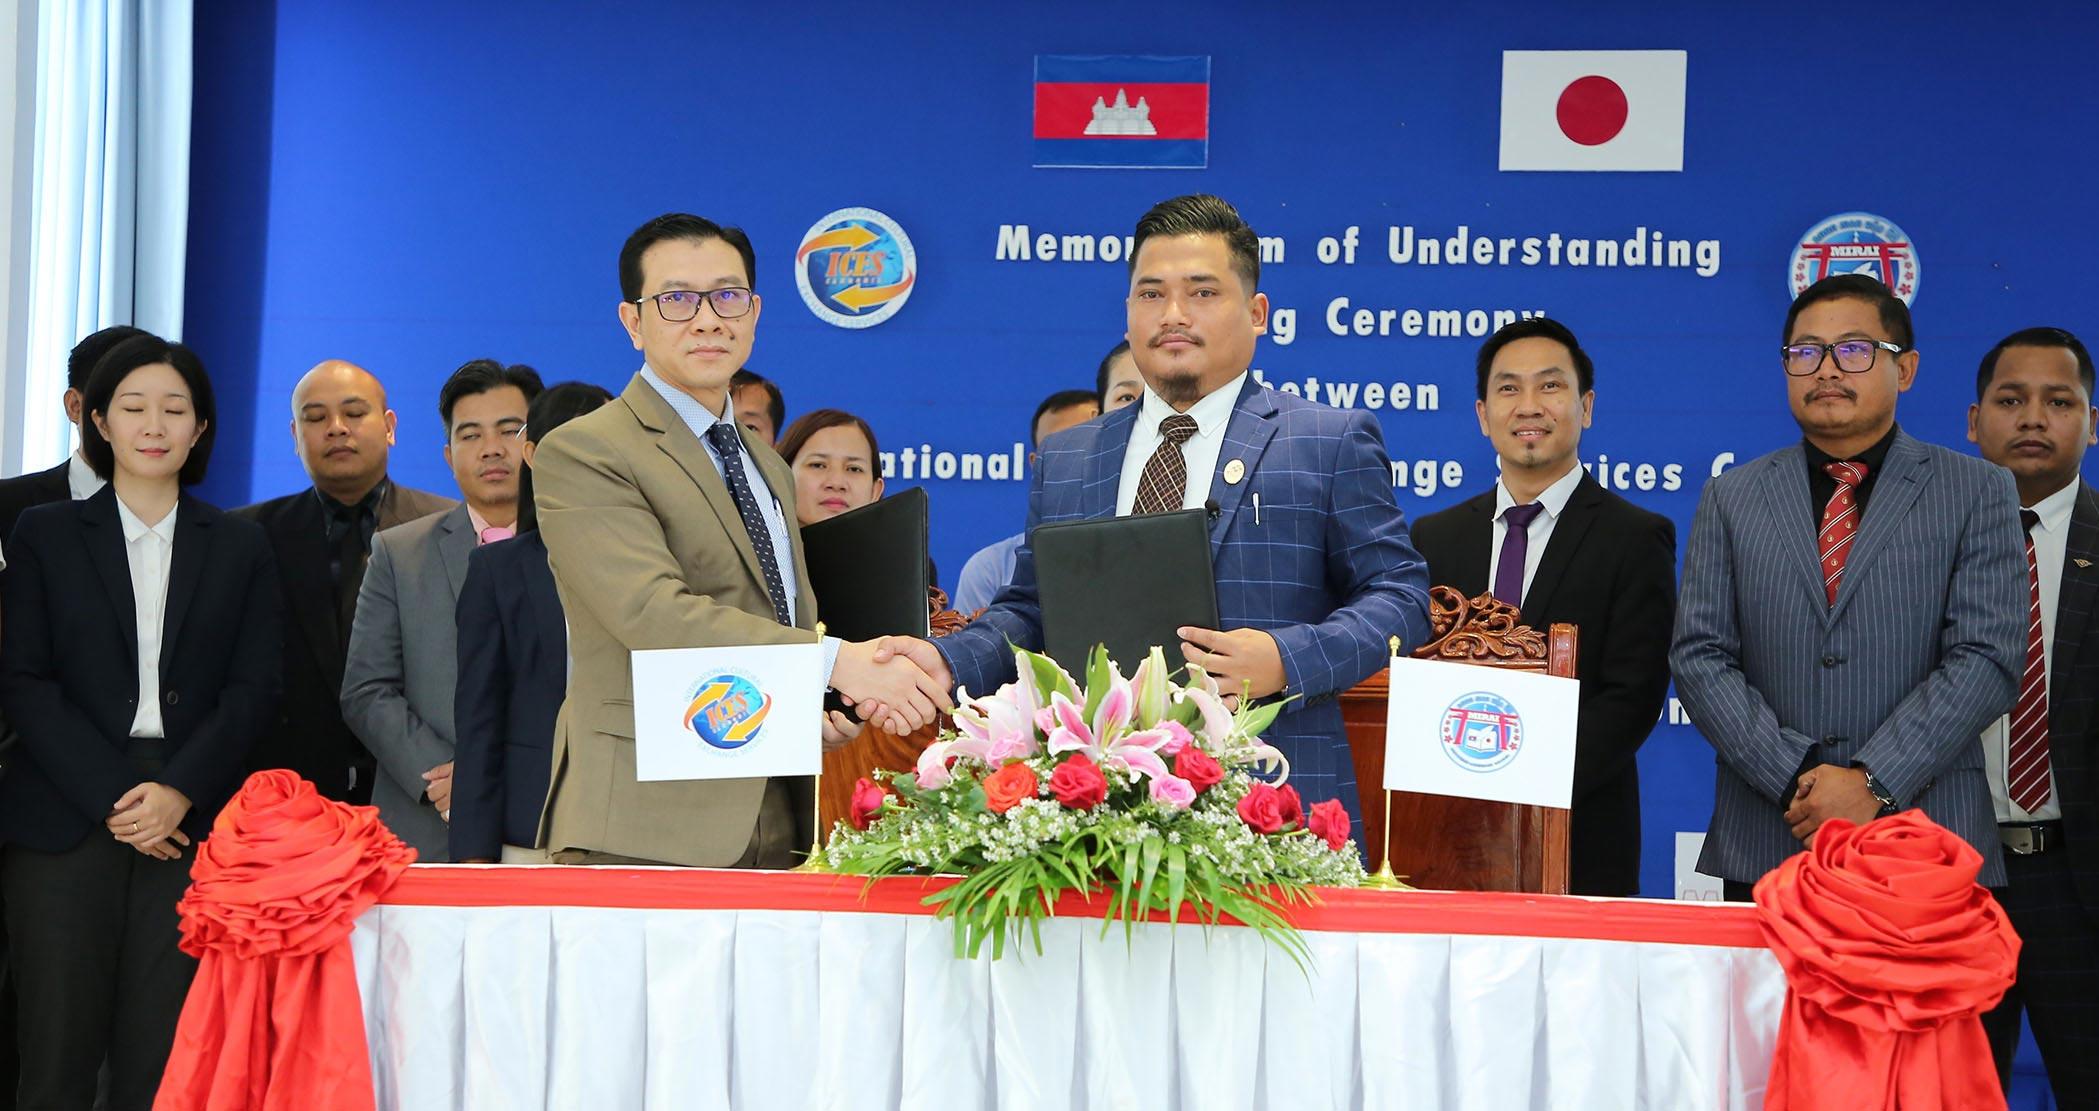 ICES Cambodia Memorandum of Understanding with Mirai Japanese Language School